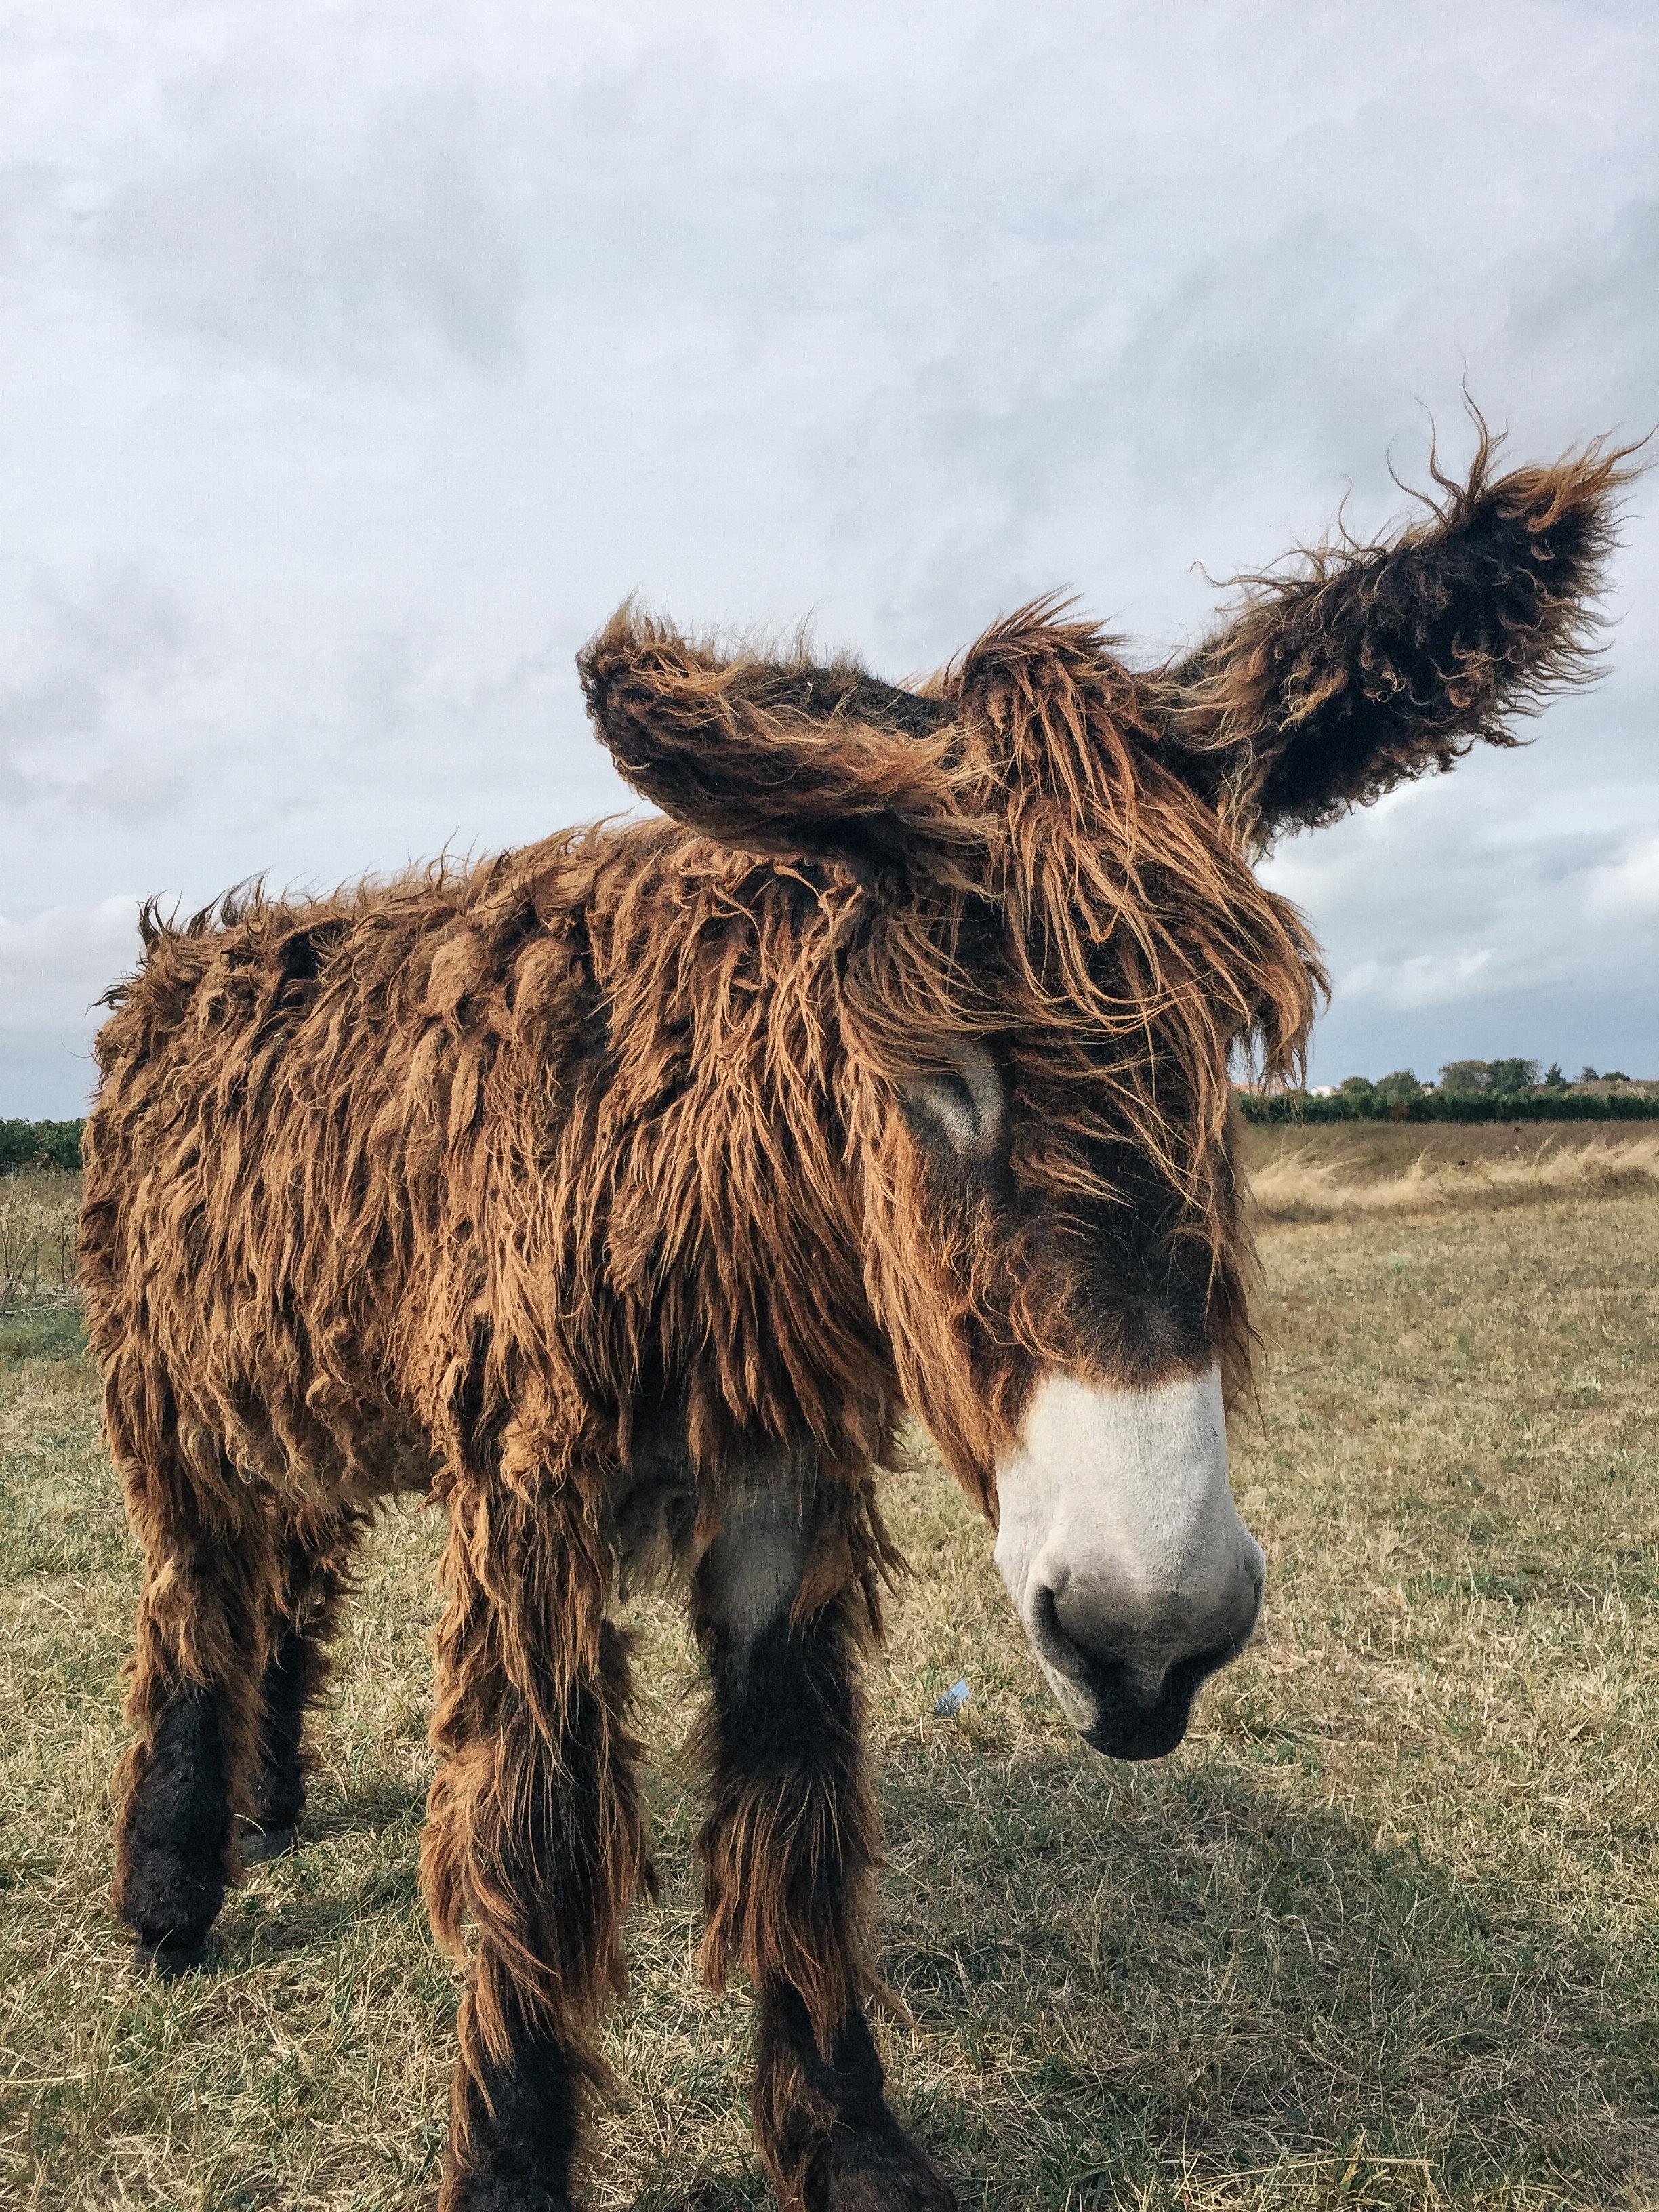 shaggy Poitou Donkey's